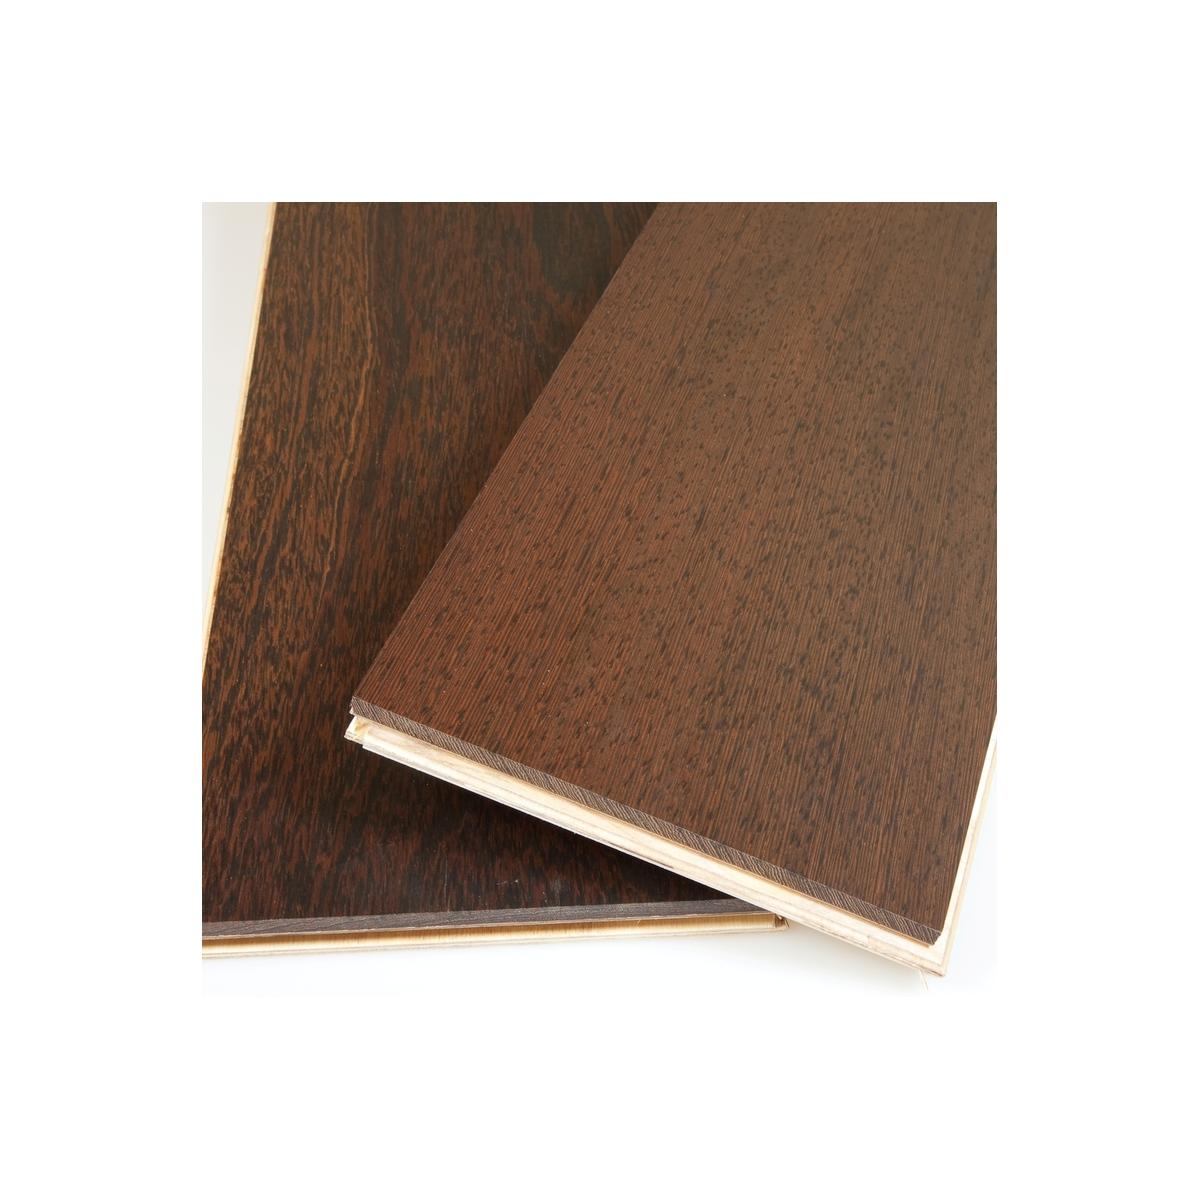 vente parquet wenge contrecoll vernis 16x140 qualit premium. Black Bedroom Furniture Sets. Home Design Ideas